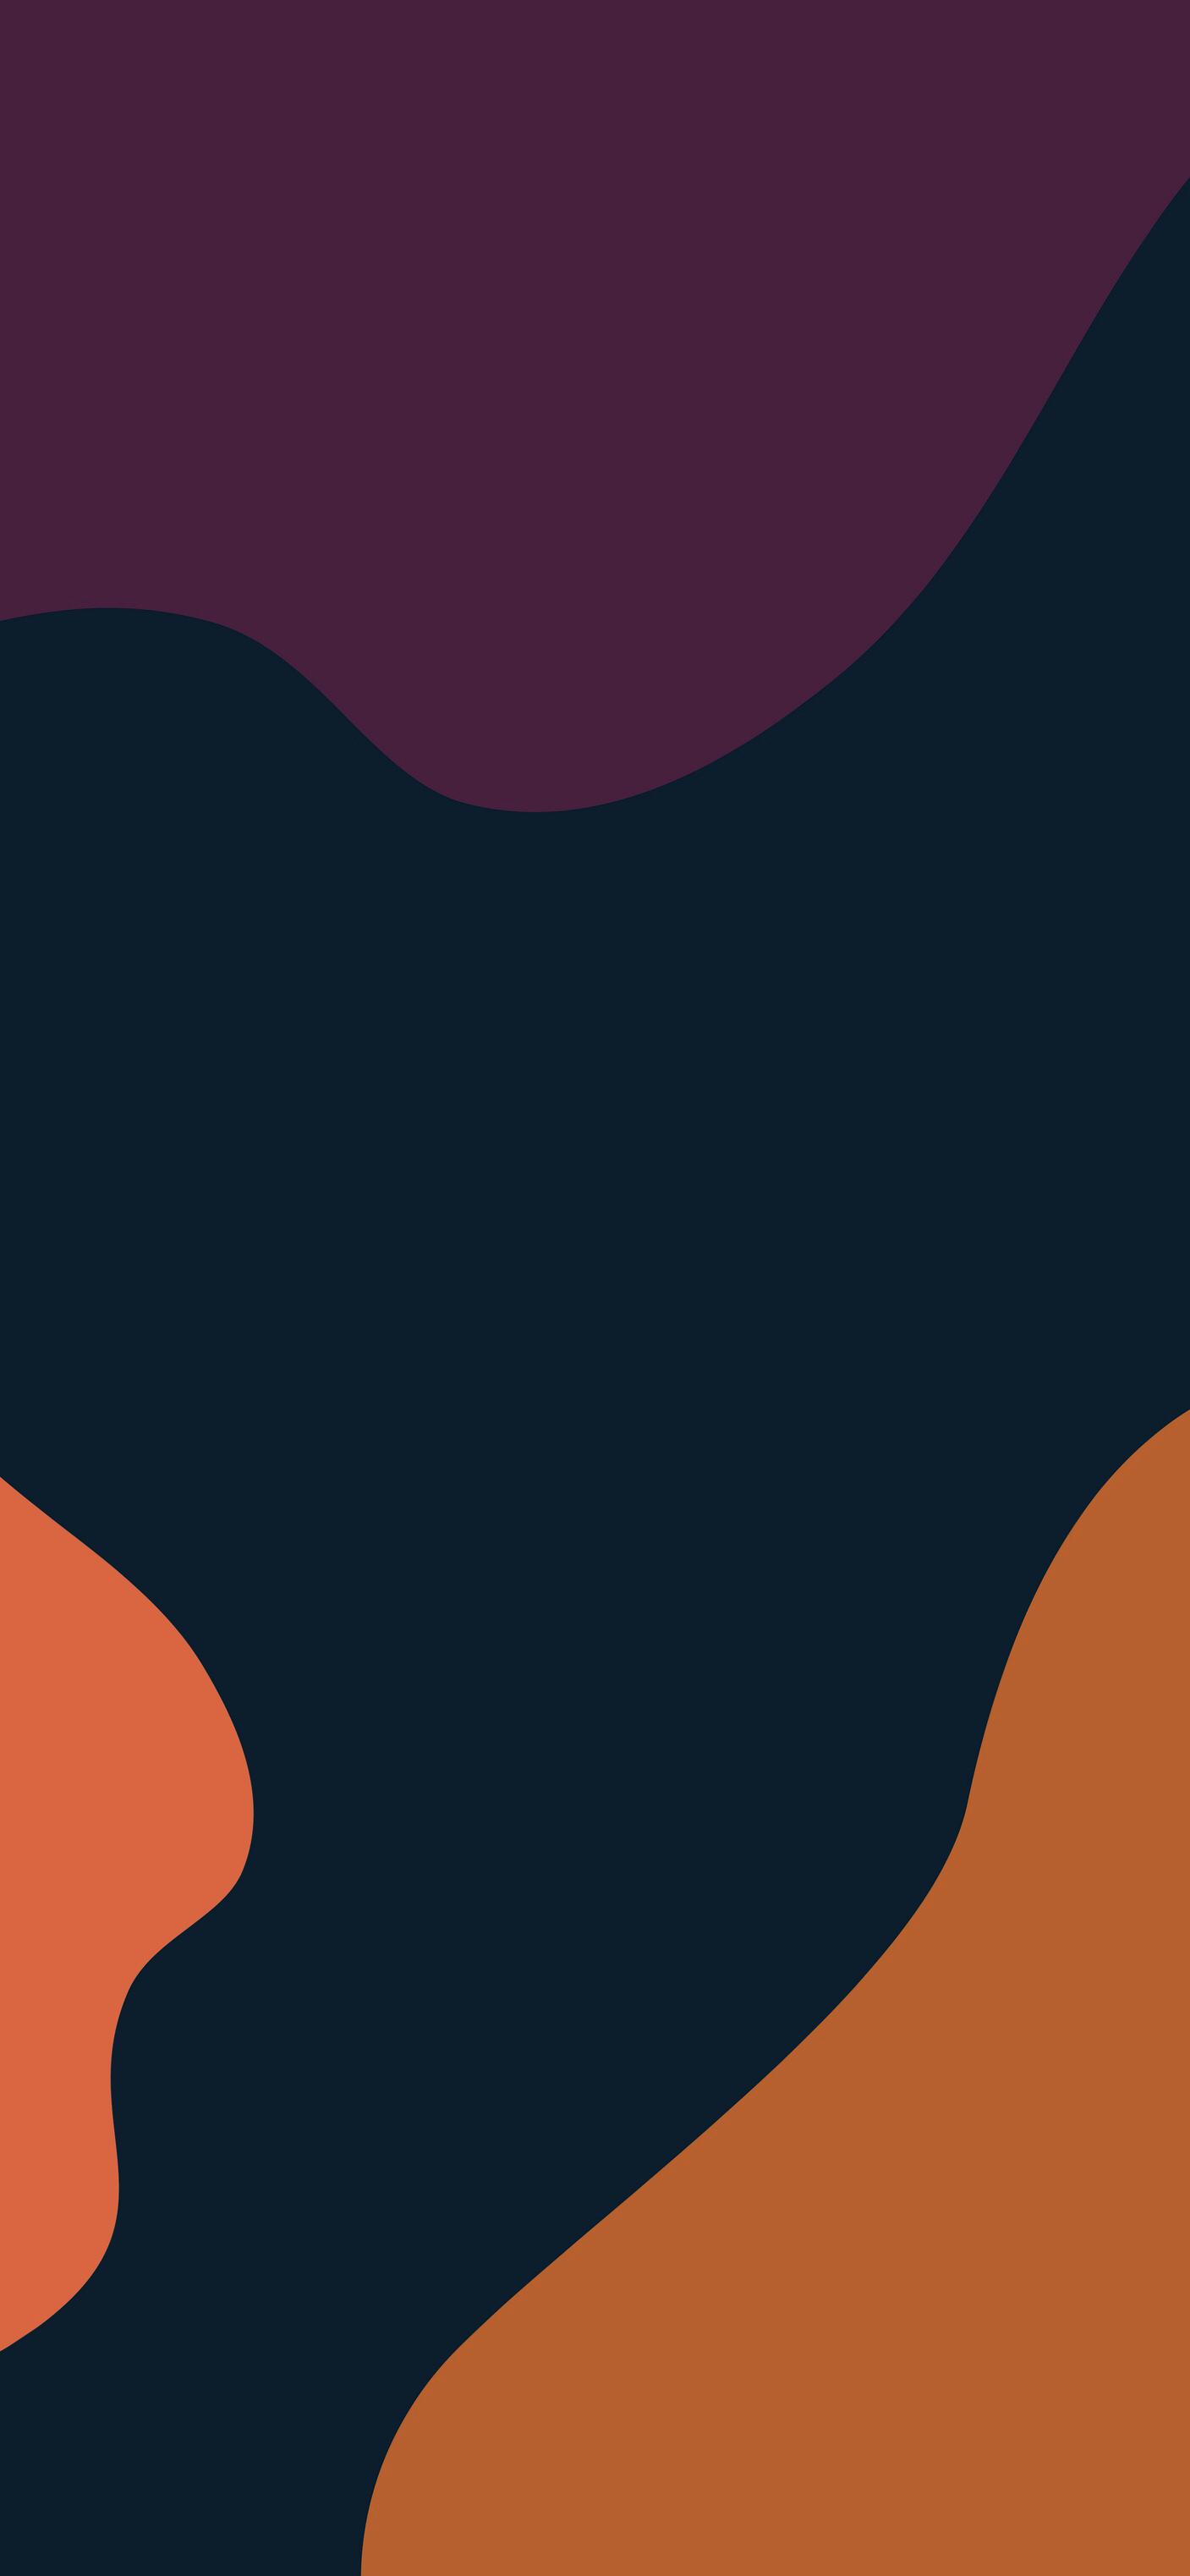 IOS13 iphonewallpaper abstract Galaxy wallpaper